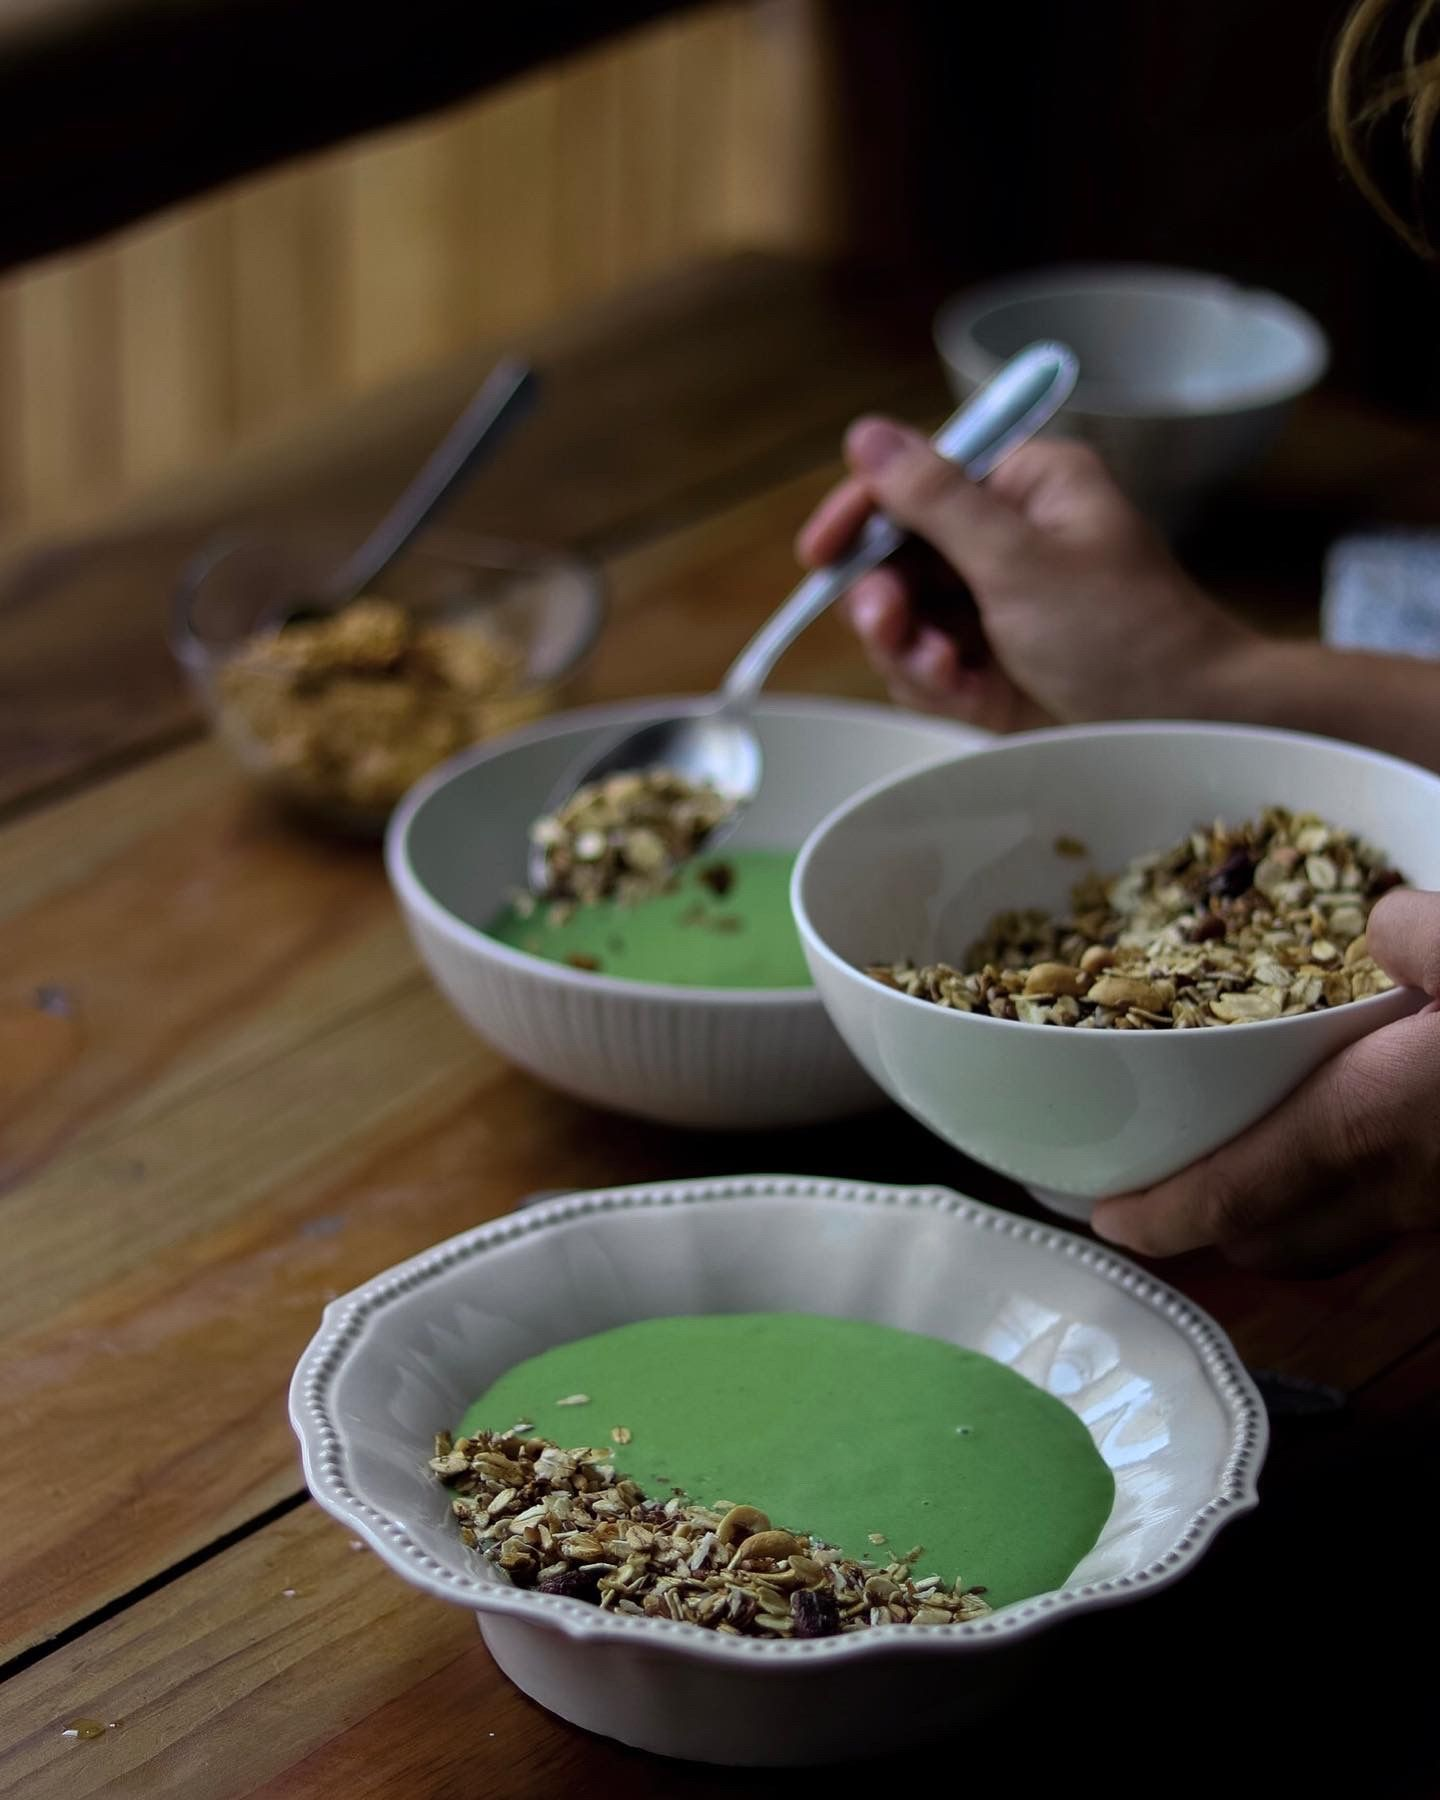 Proteinrik grön smoothiebowl, Grön smoothiebowl till frukost eller mellanmål